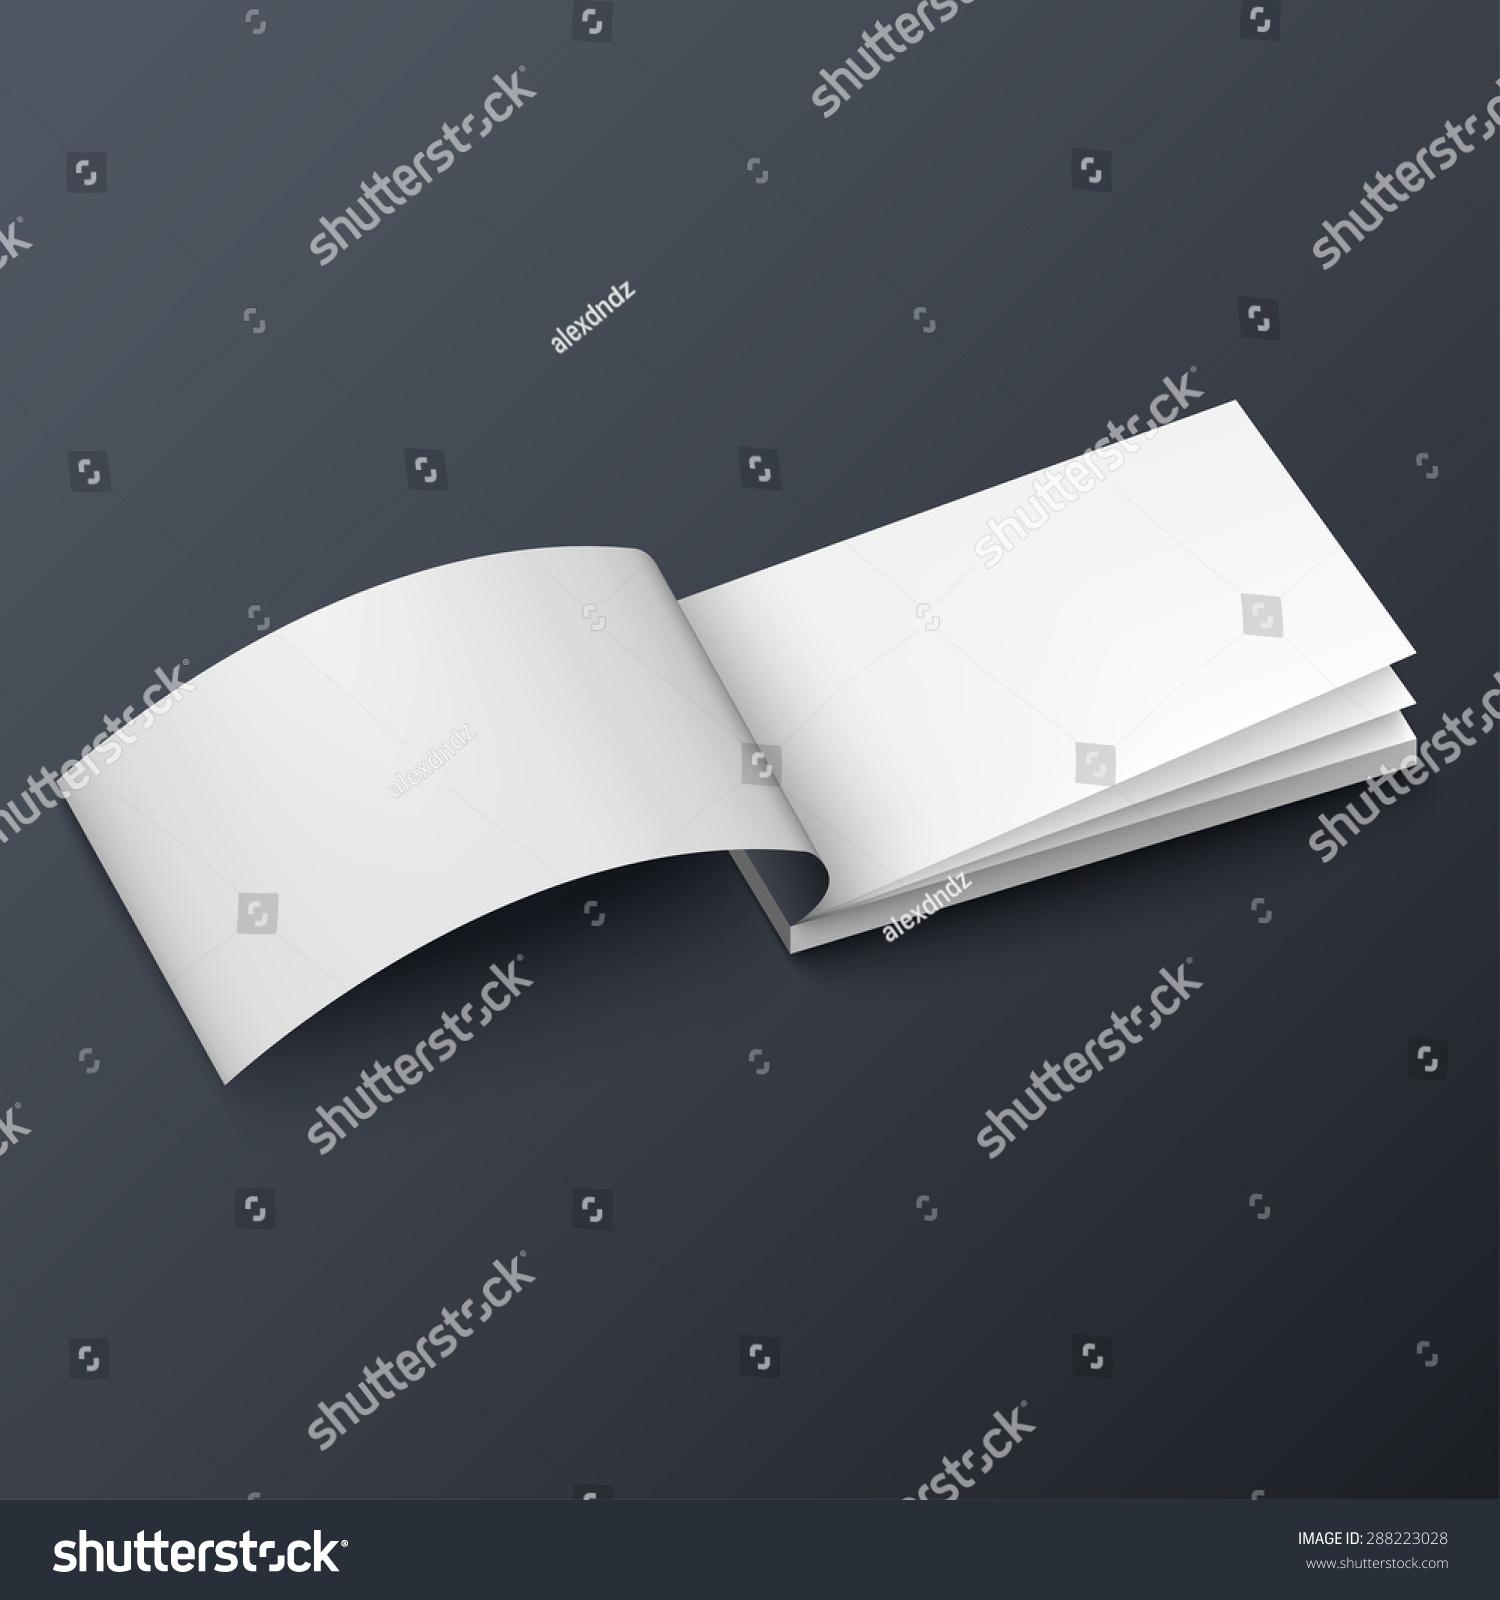 Notepad Booklet Business Card Brochure Mockup Stock Vector ...